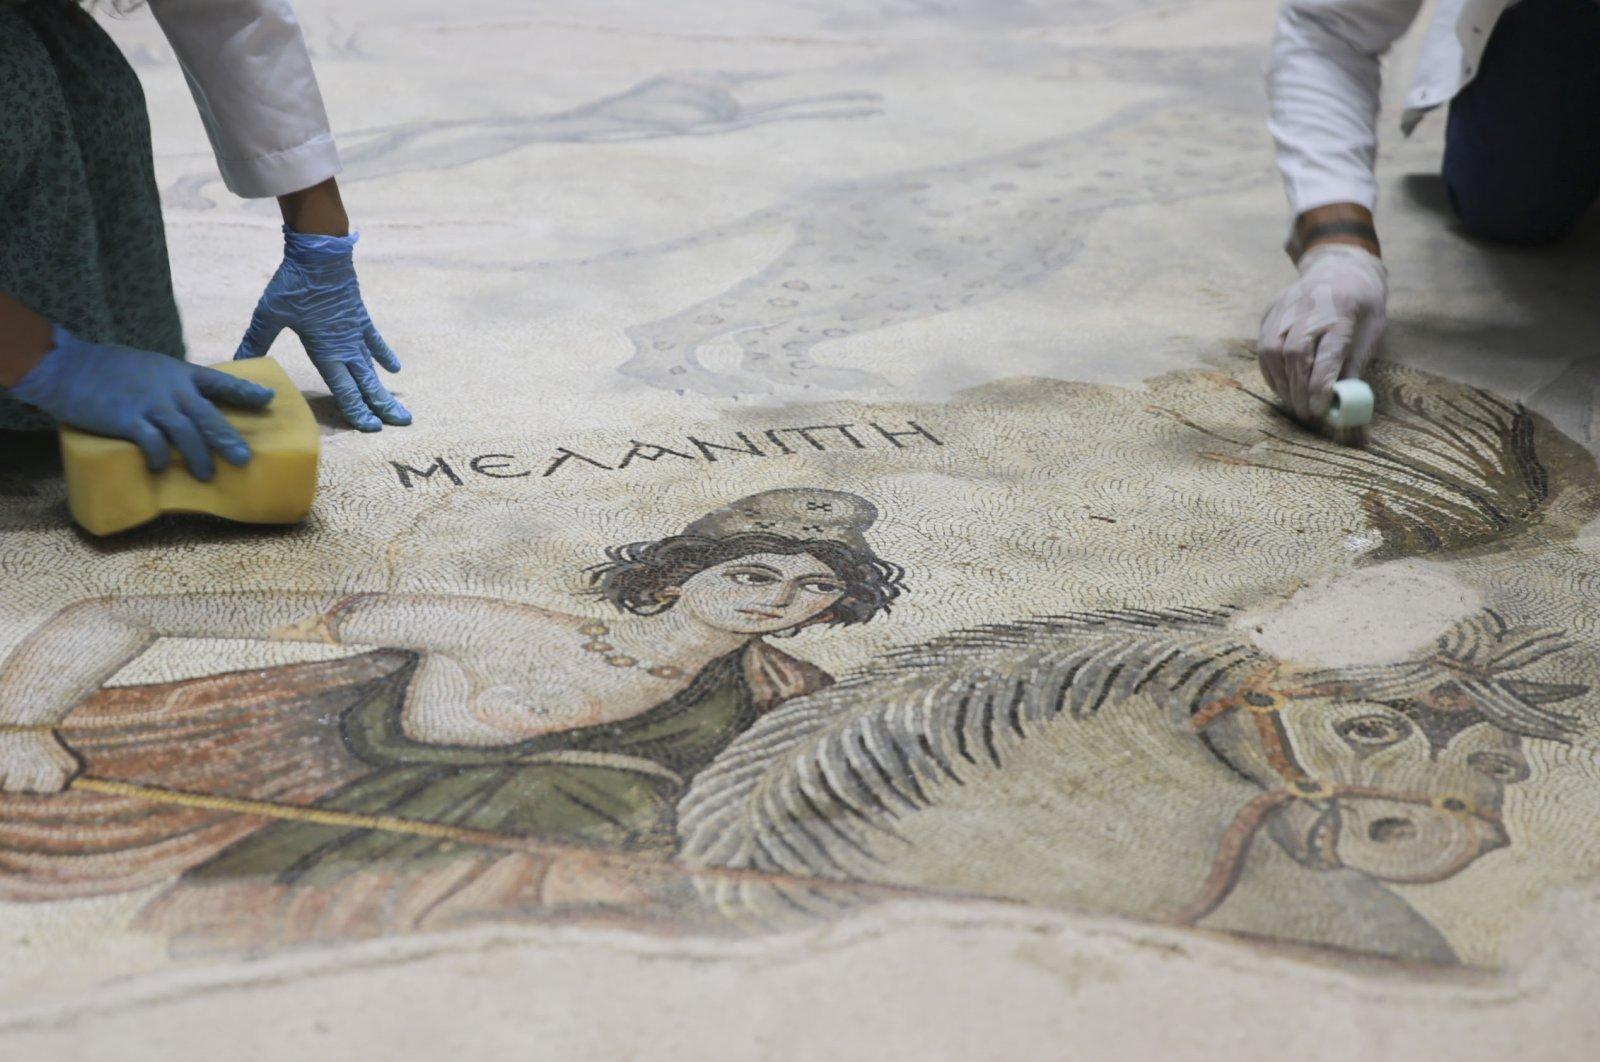 Experts work on a mosaic at the Şanlıurfa Archaeology Museum, southeastern Turkey, Sept. 12, 2021. (AA Photo)